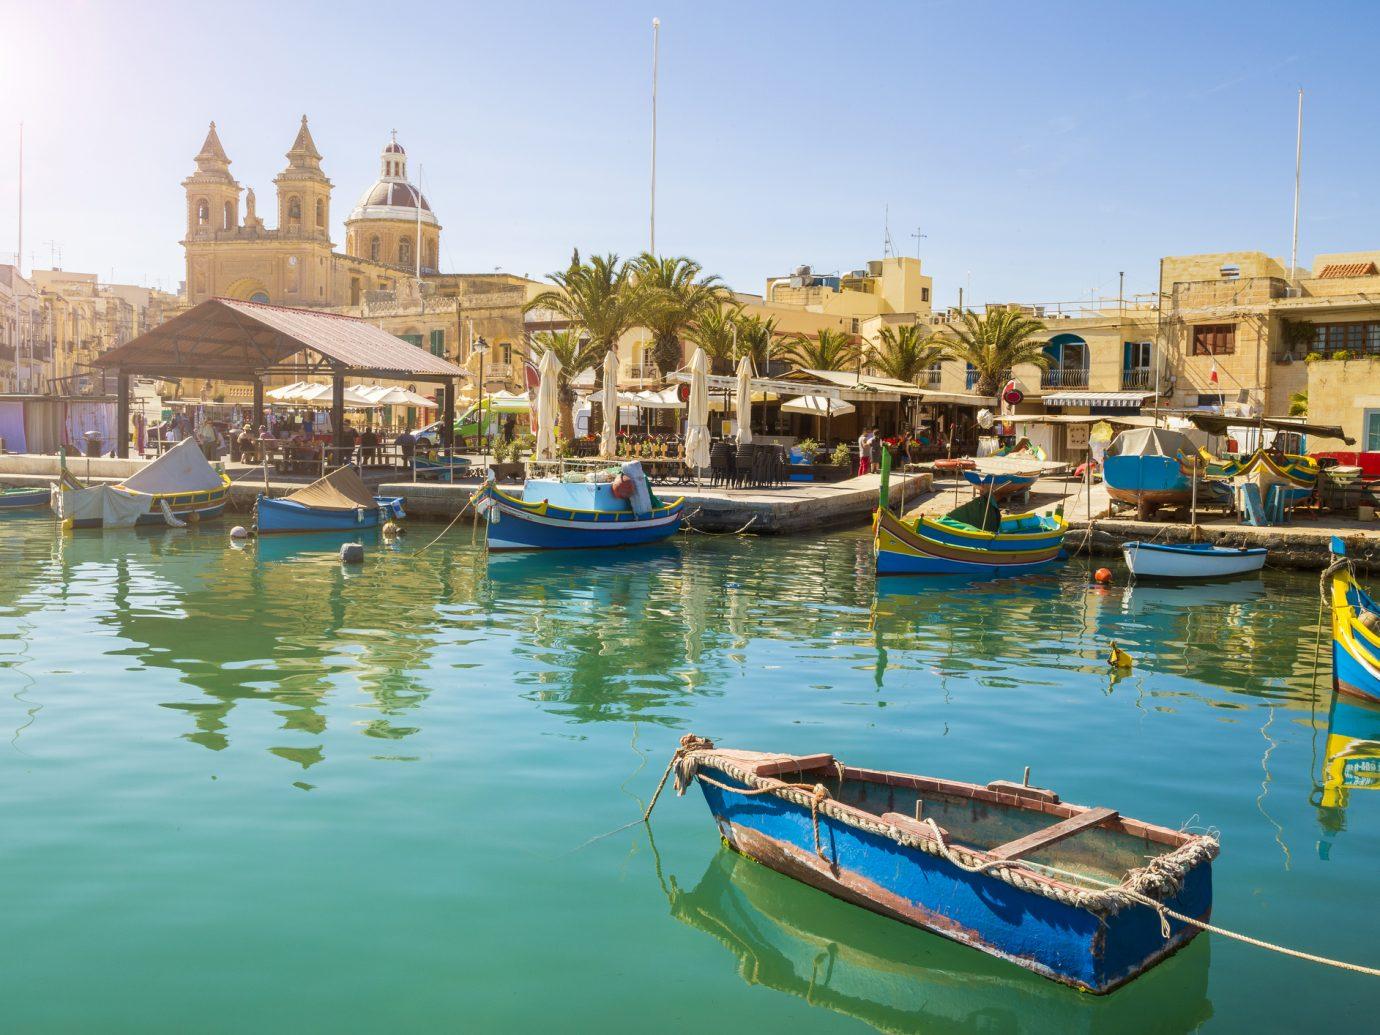 Malta - Marsaxlokk market with traditional colorful Luzzu fishing boats